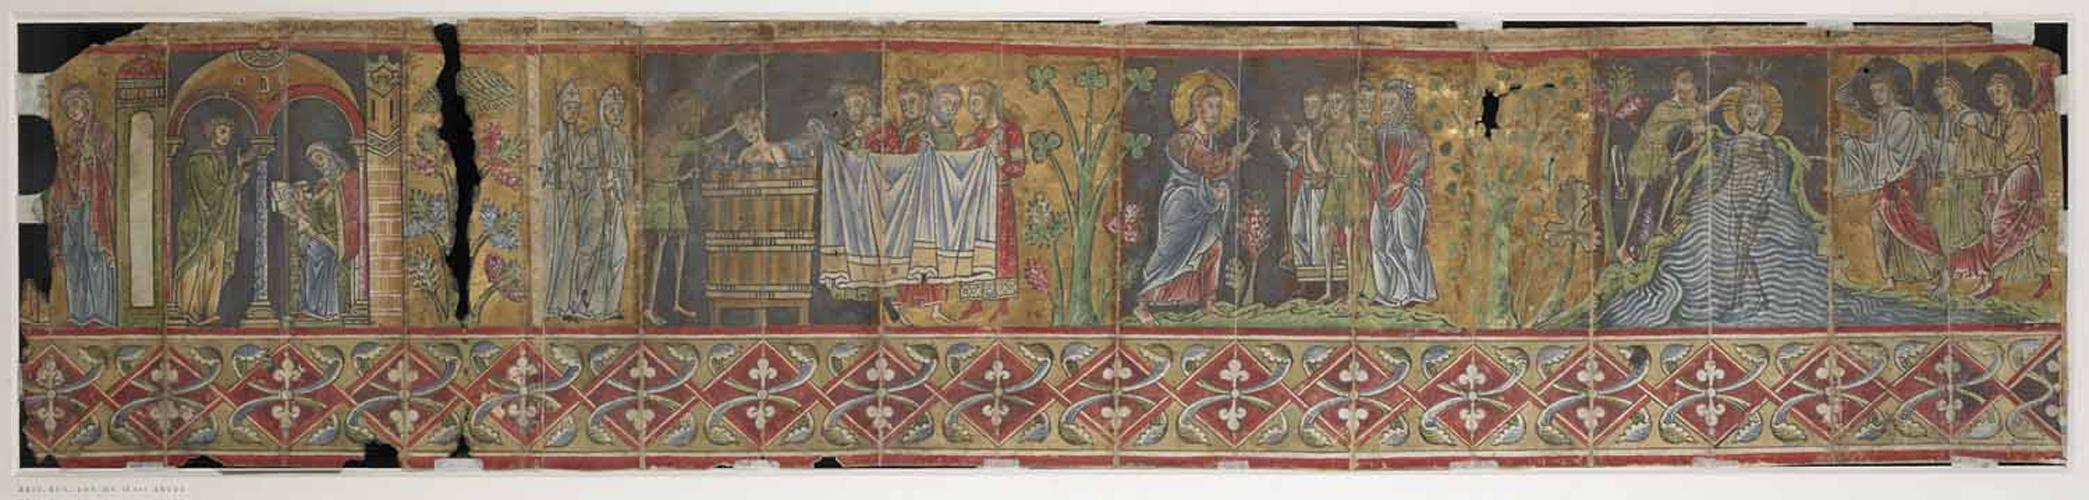 The life of John the Baptist, scenes 1-5